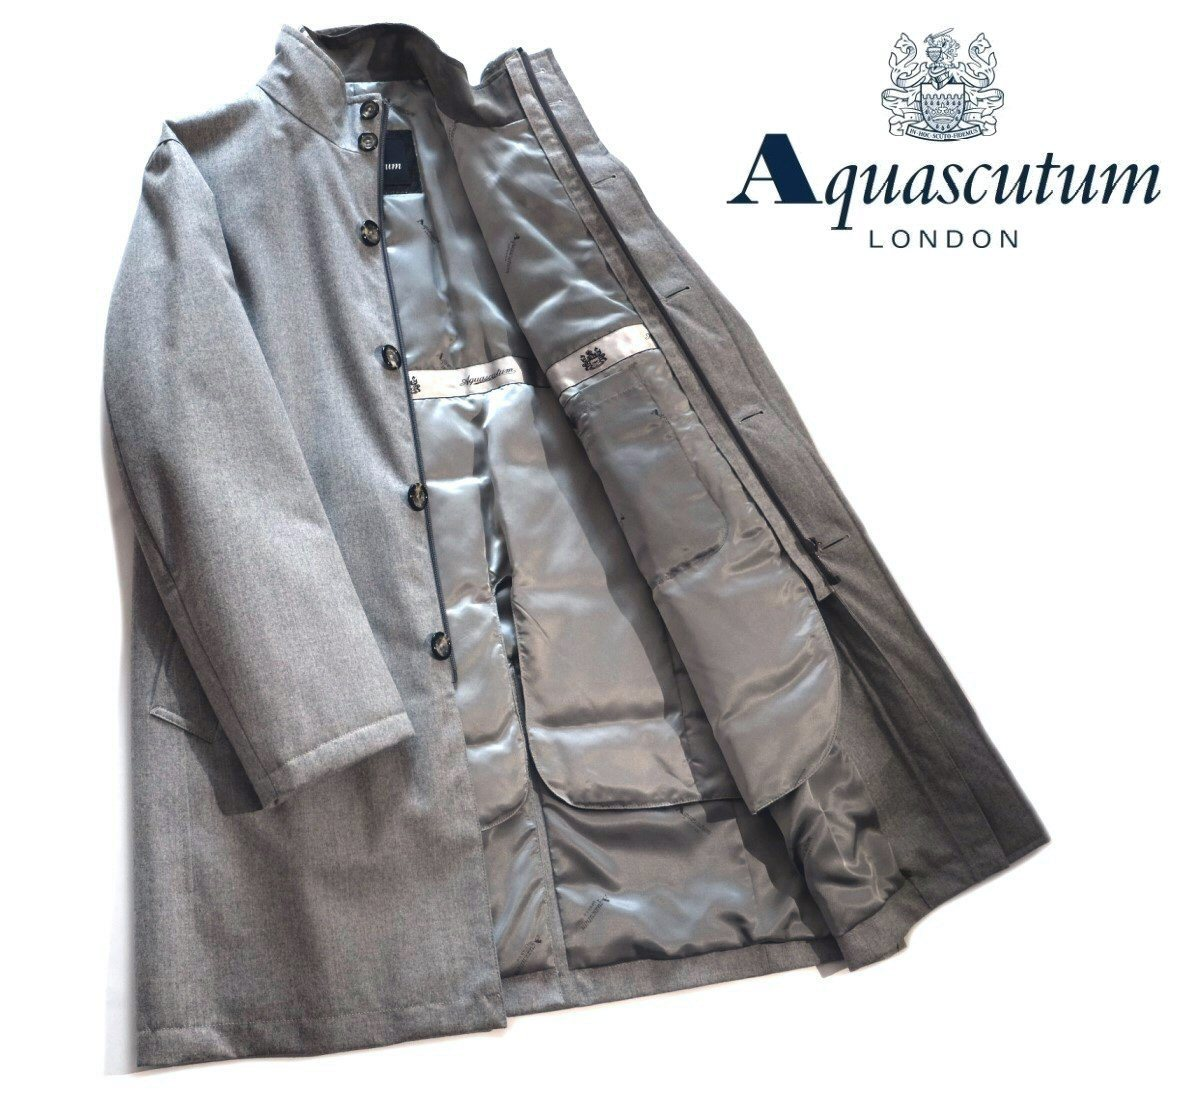 Aquascutum【アクアスキュータム】定価154,000円(税込)◆40%OFF◆撥水加工取り外し可能ダウンライナー付き中綿入りスタンドカラーコートライトグレー